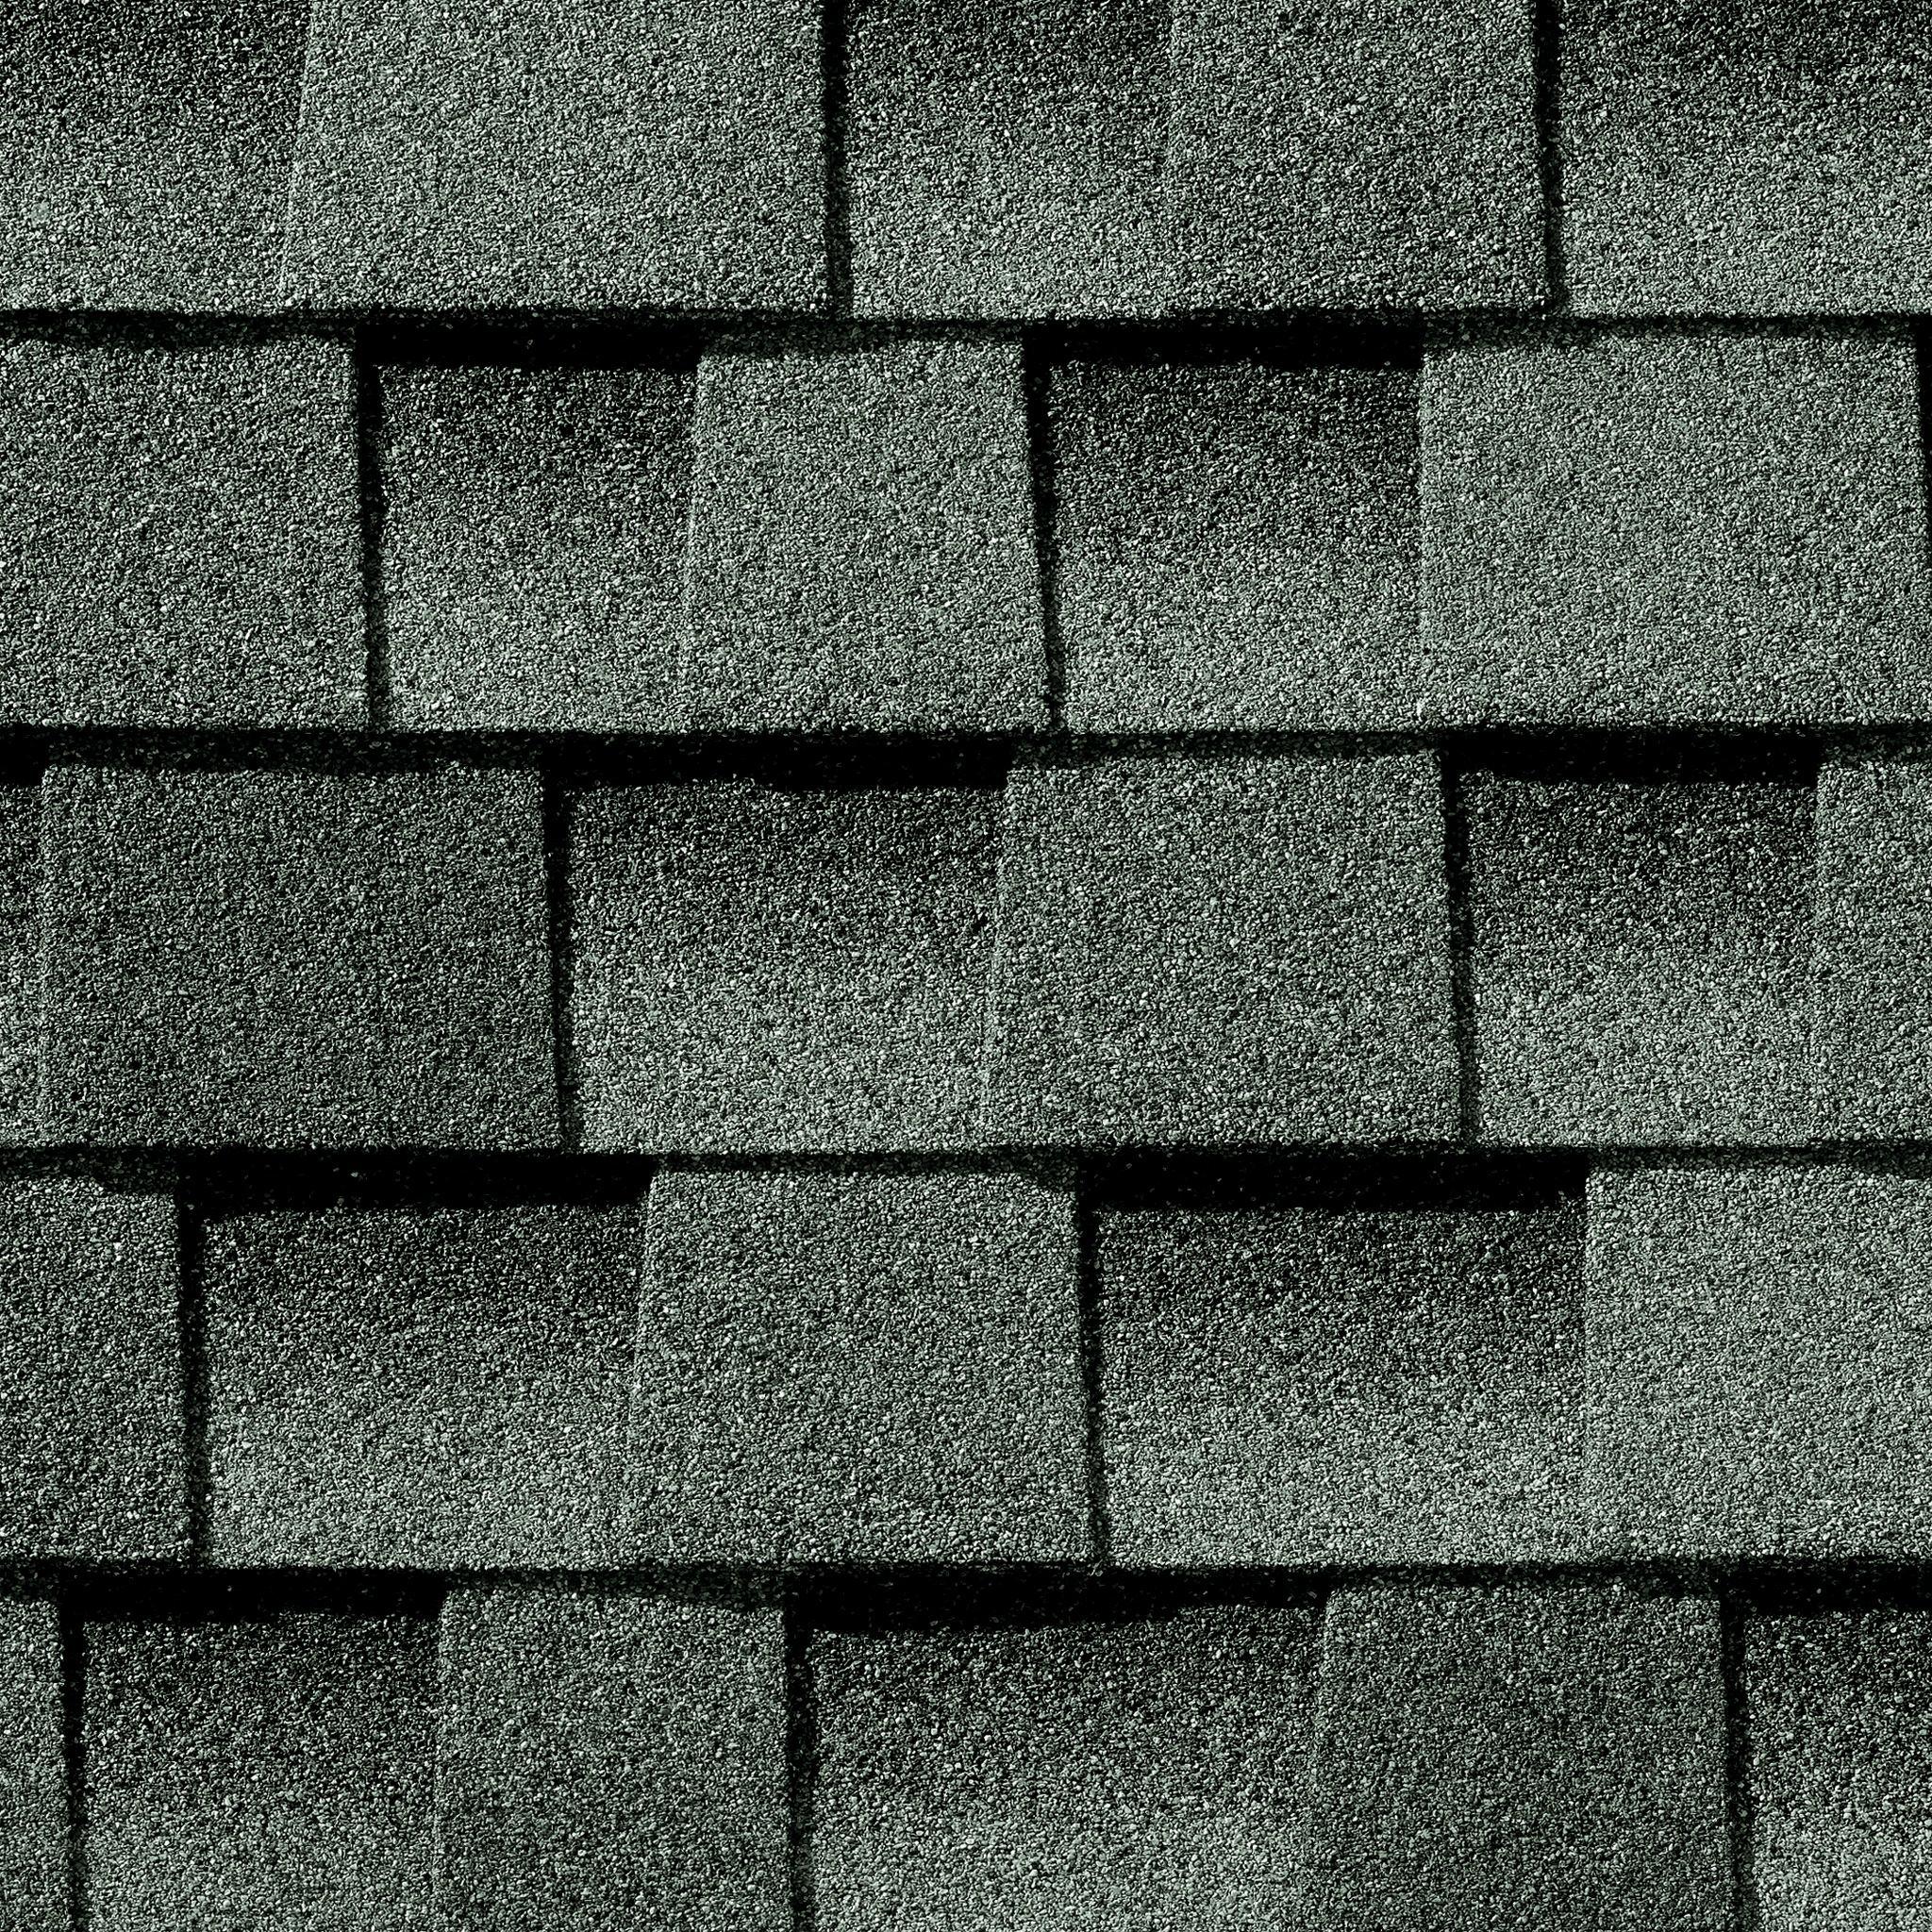 Close up photo of GAF's Timberline HD Slate shingle swatch